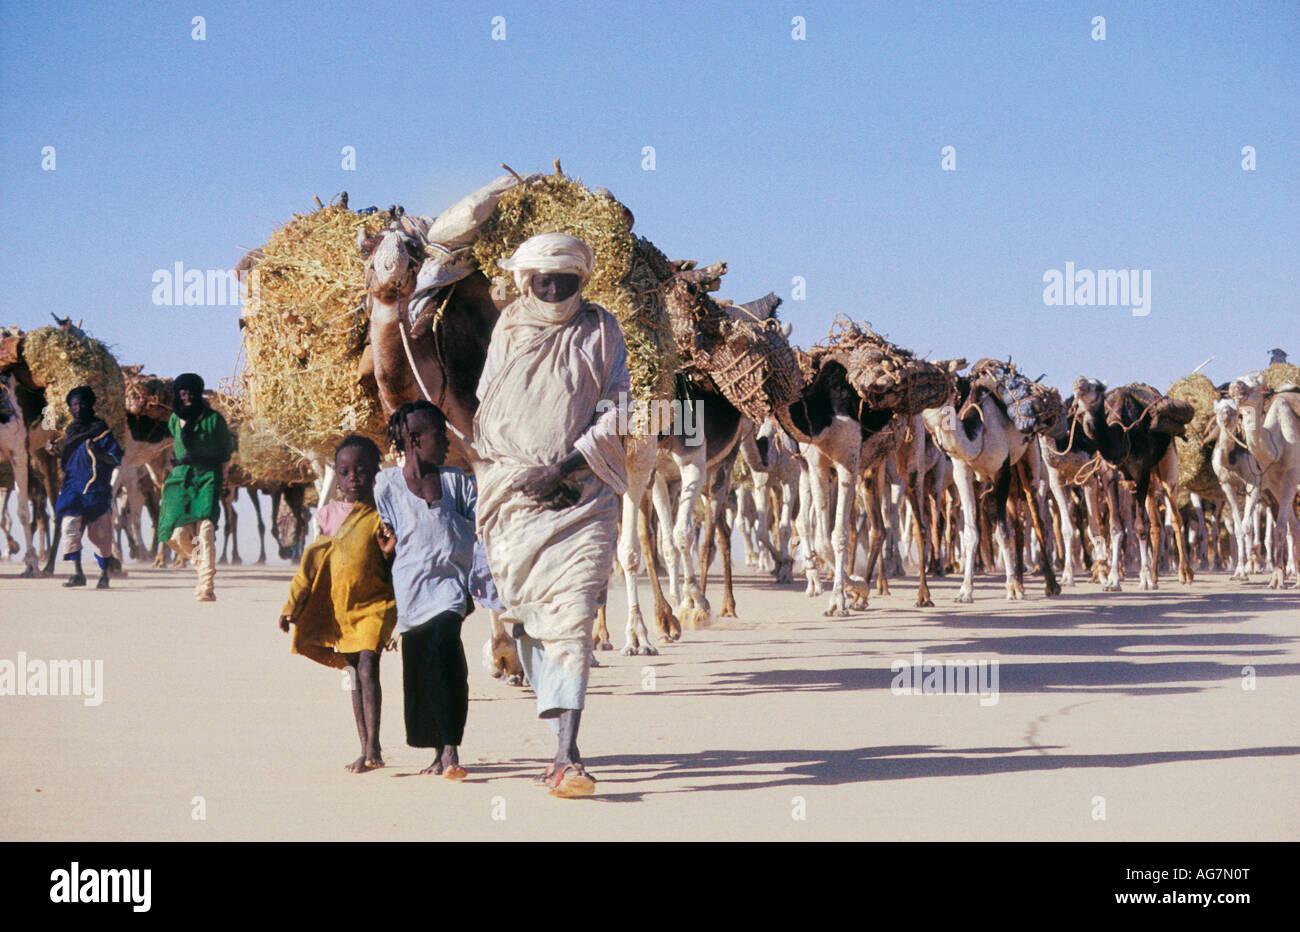 Niger Tenere Tuareg tribe doing traditional salt caravan from Agadez to the oases Fachi and Bilma - Stock Image